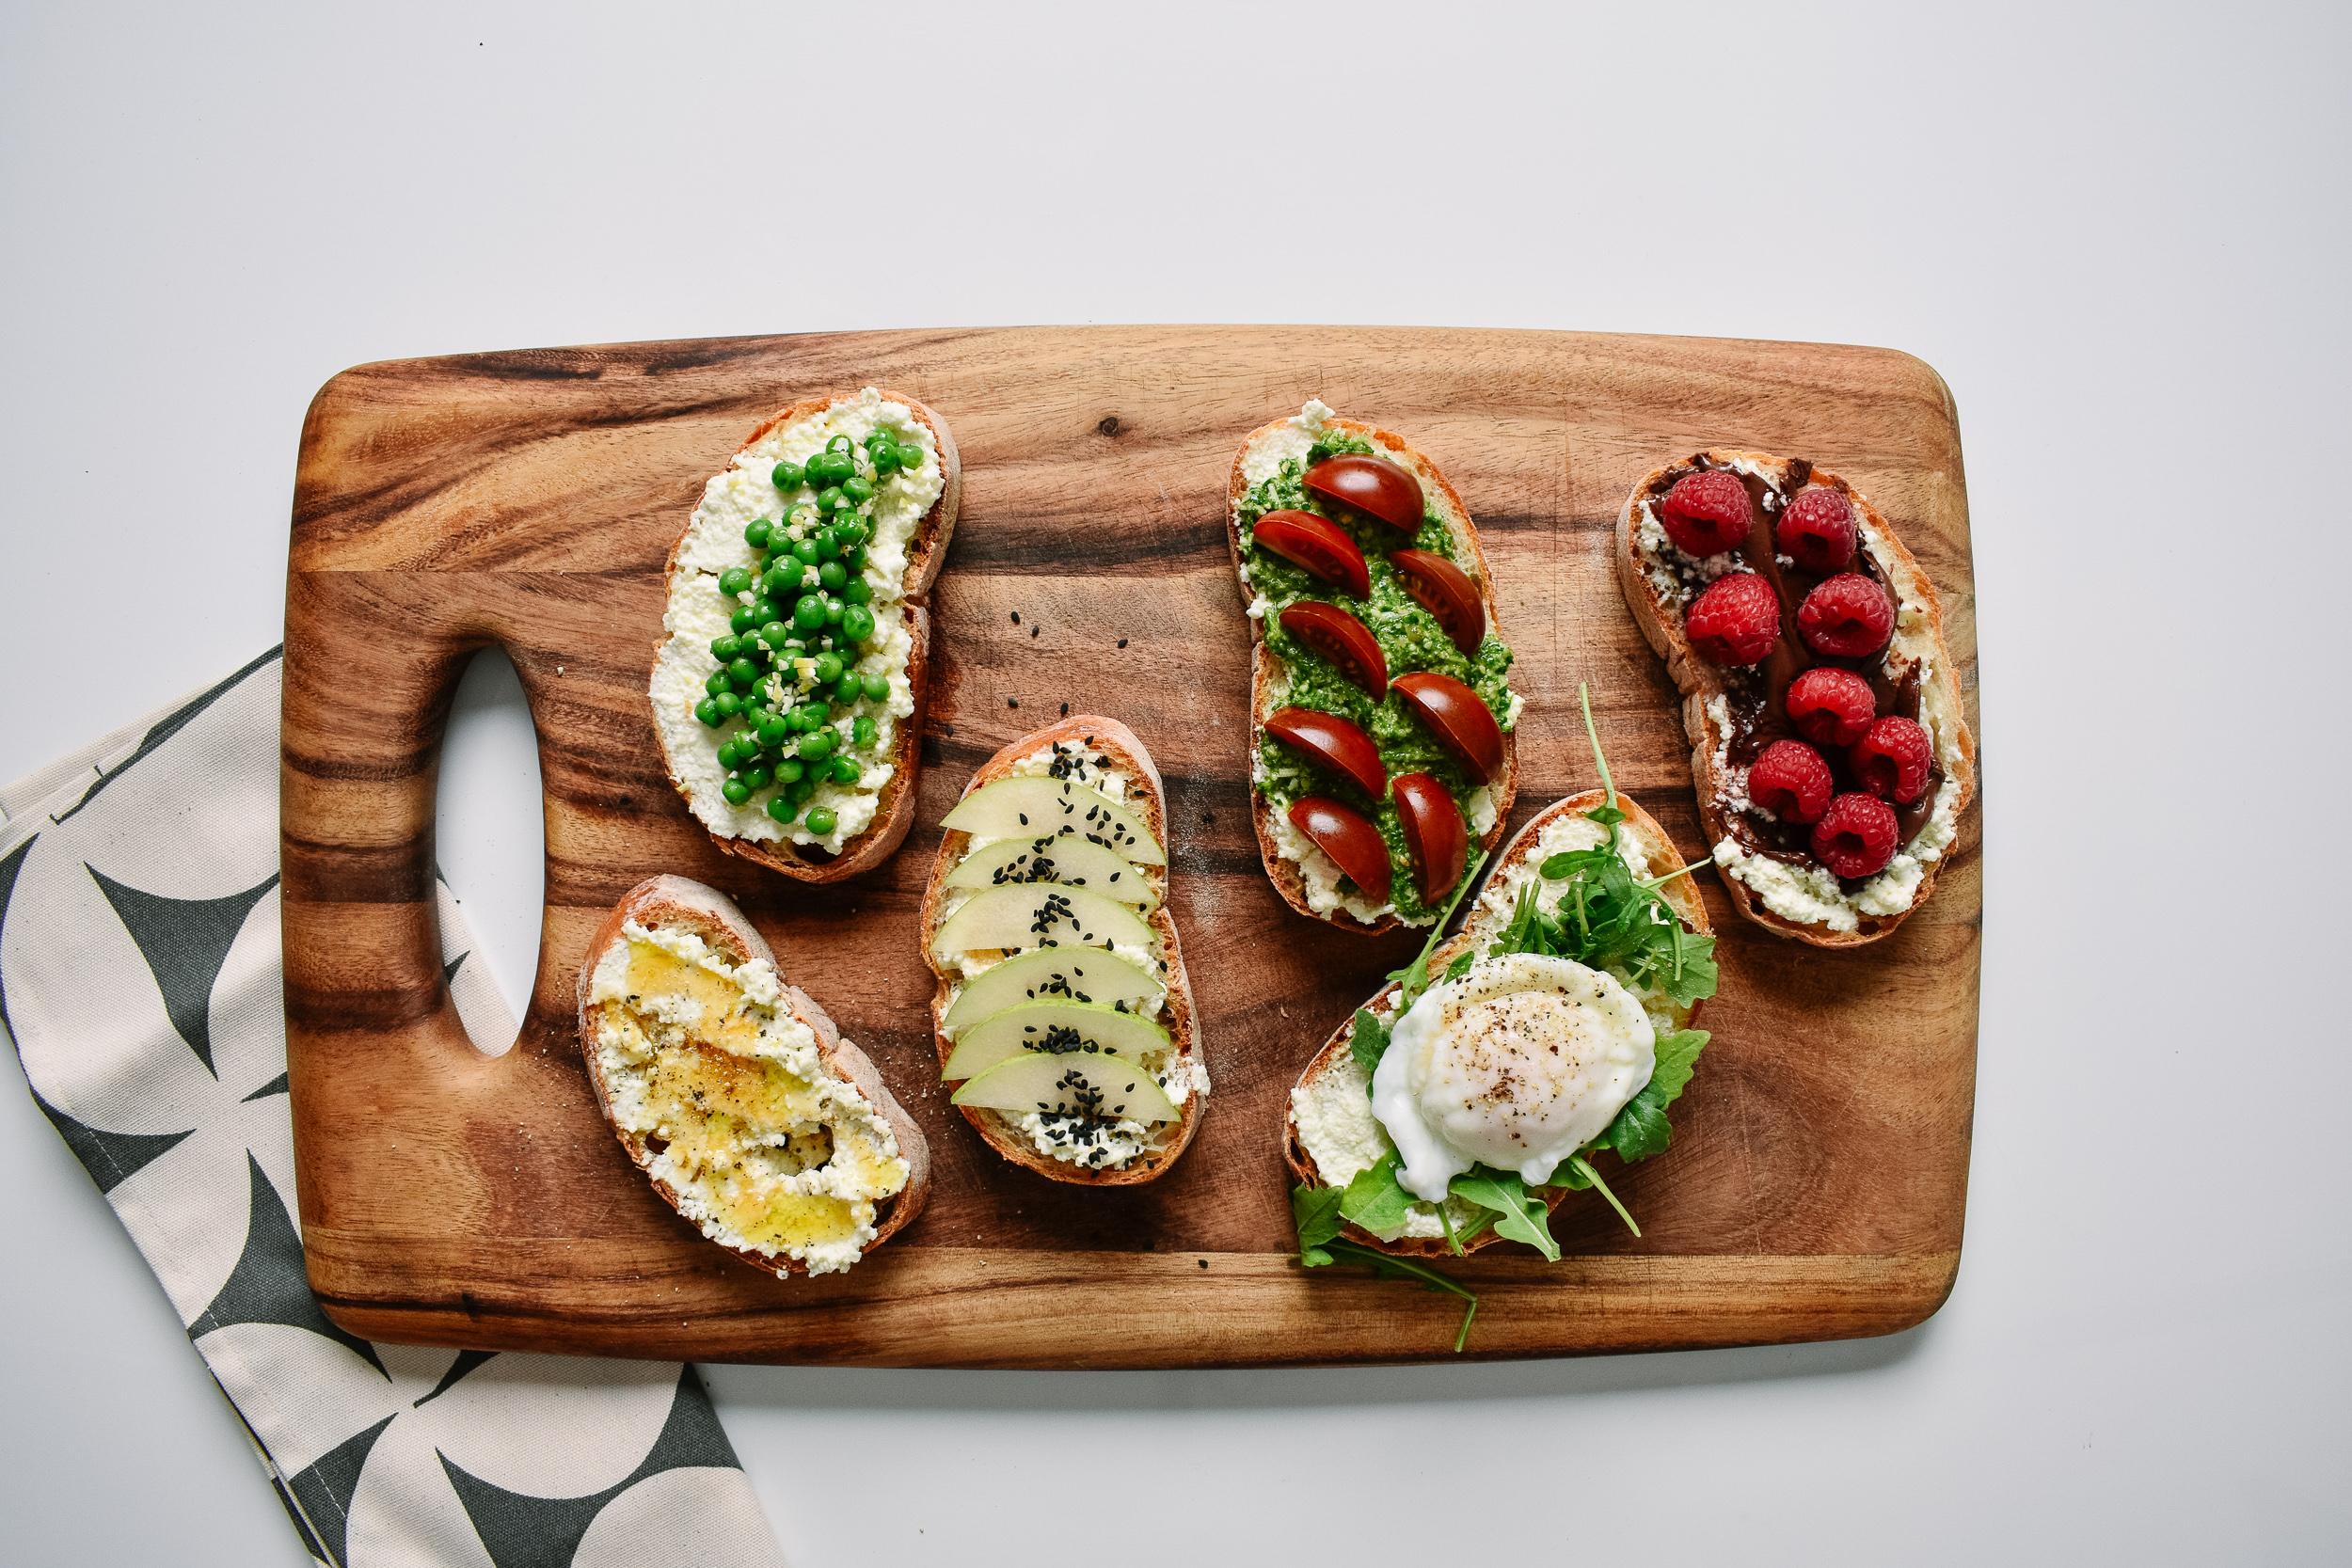 Ricotta toast - With tomatoes + pesto.